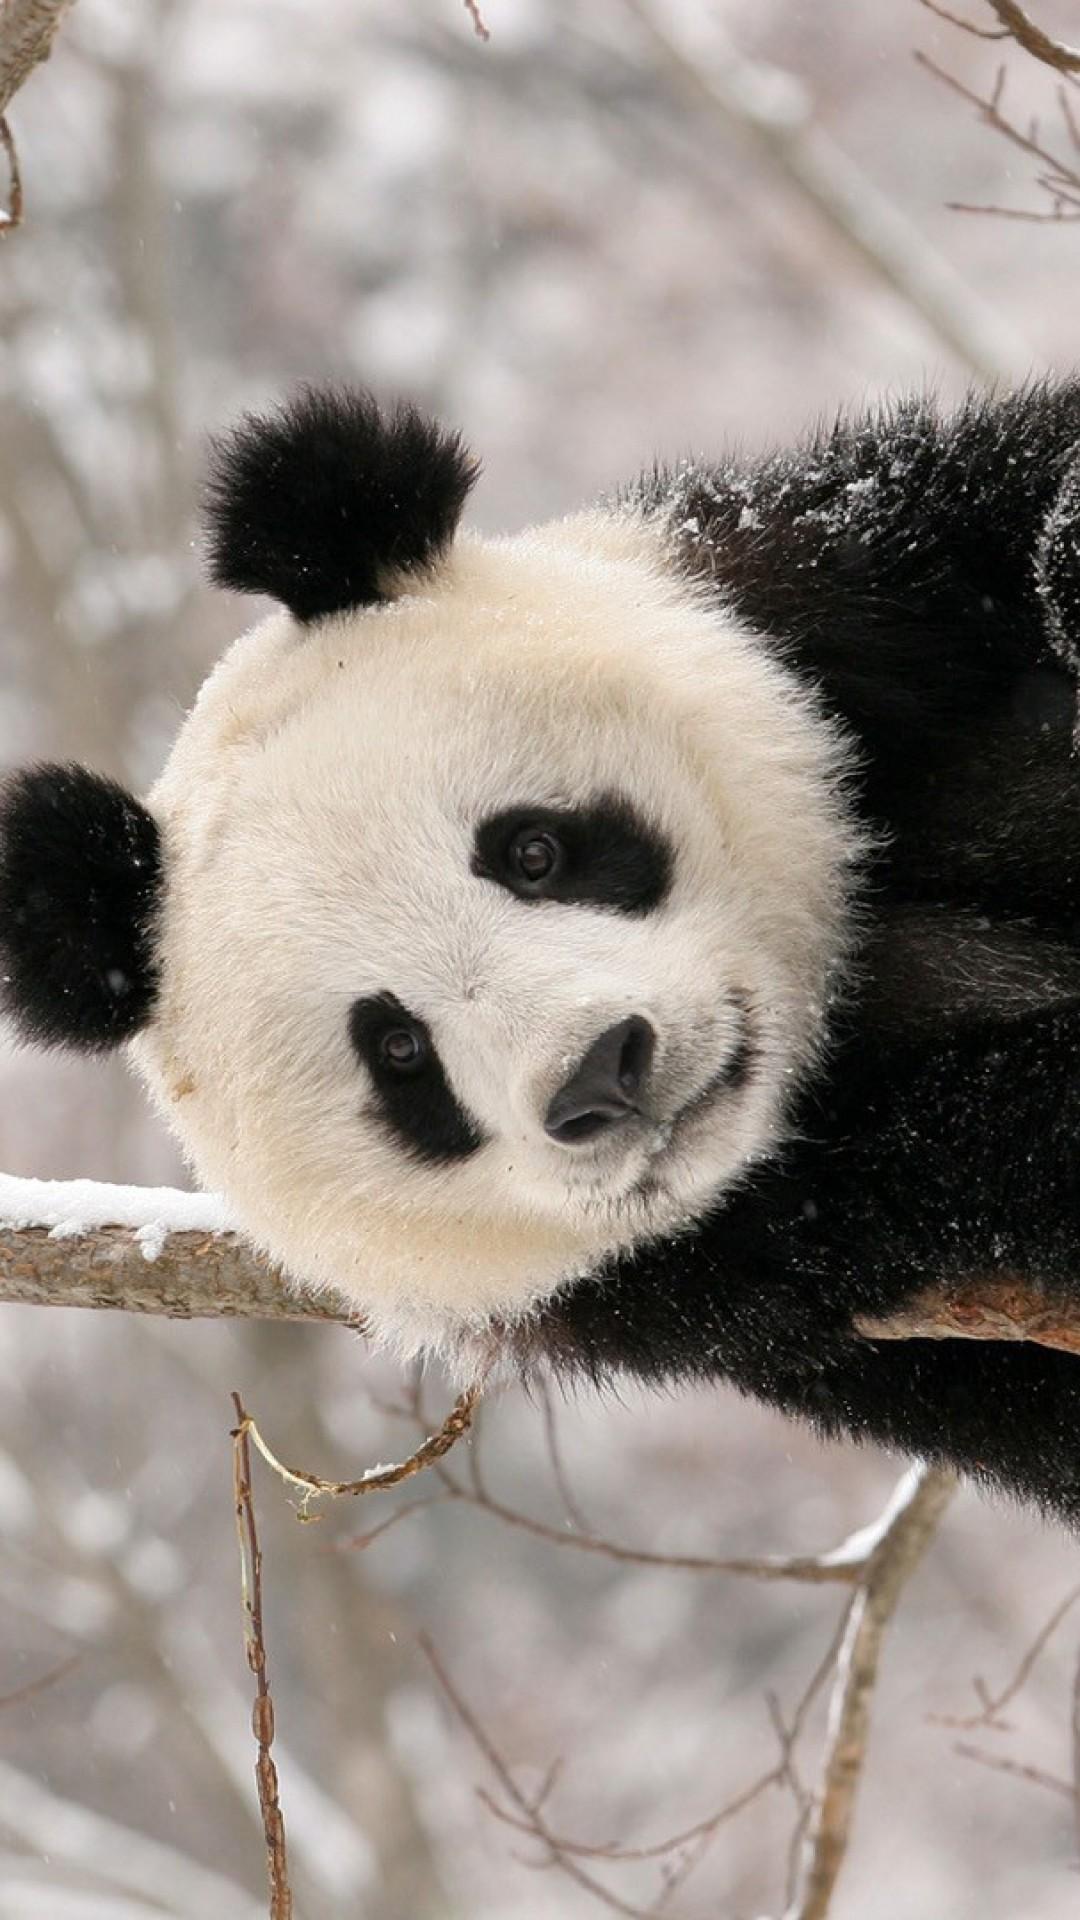 hinh gau truc panda 32